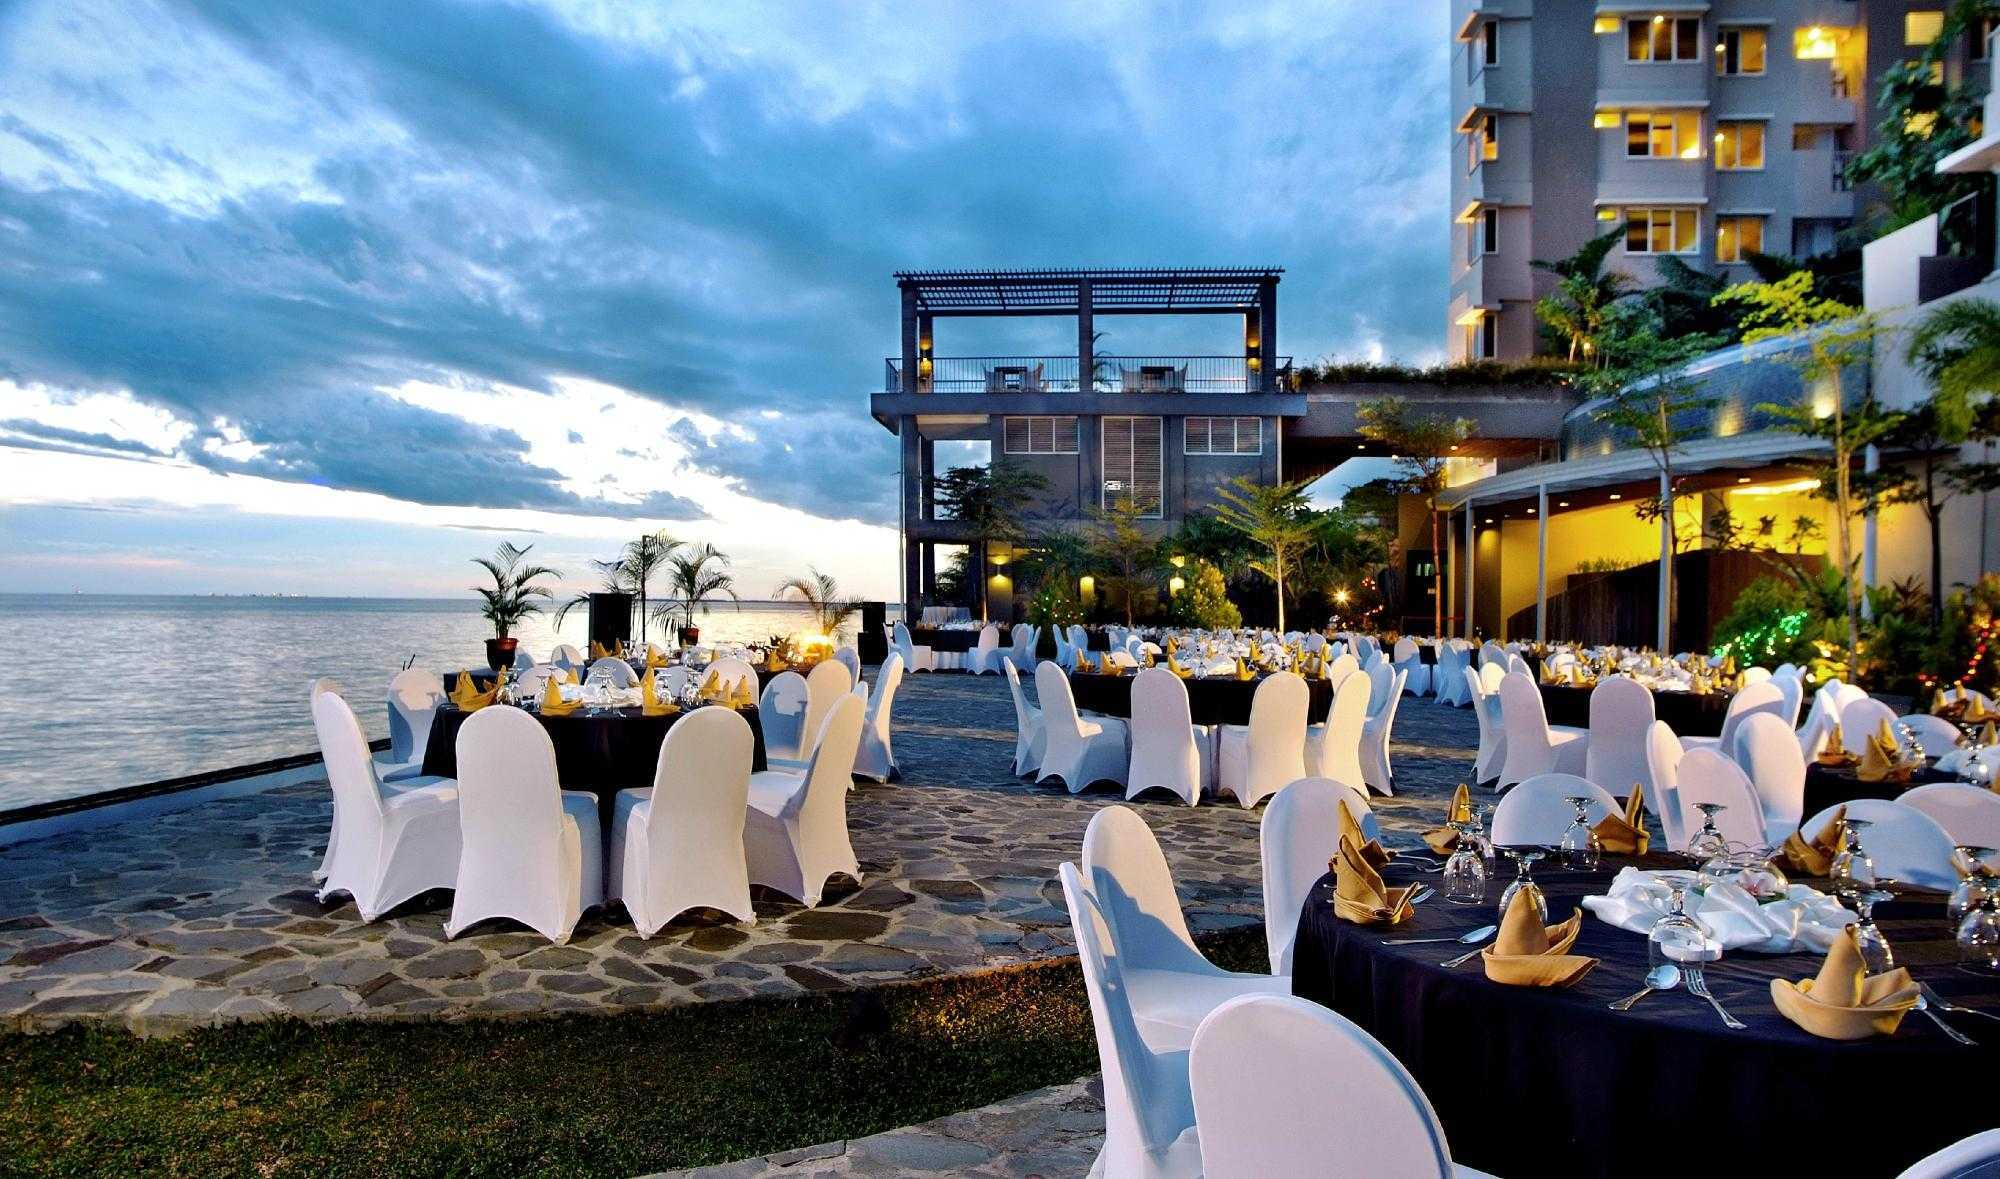 Indra Gunadi Aston Hotel & Apartment Balikpapan Balikpapan, Balikpapan City, East Kalimantan, Indonesia Balikpapan Dining Area Modern  24882